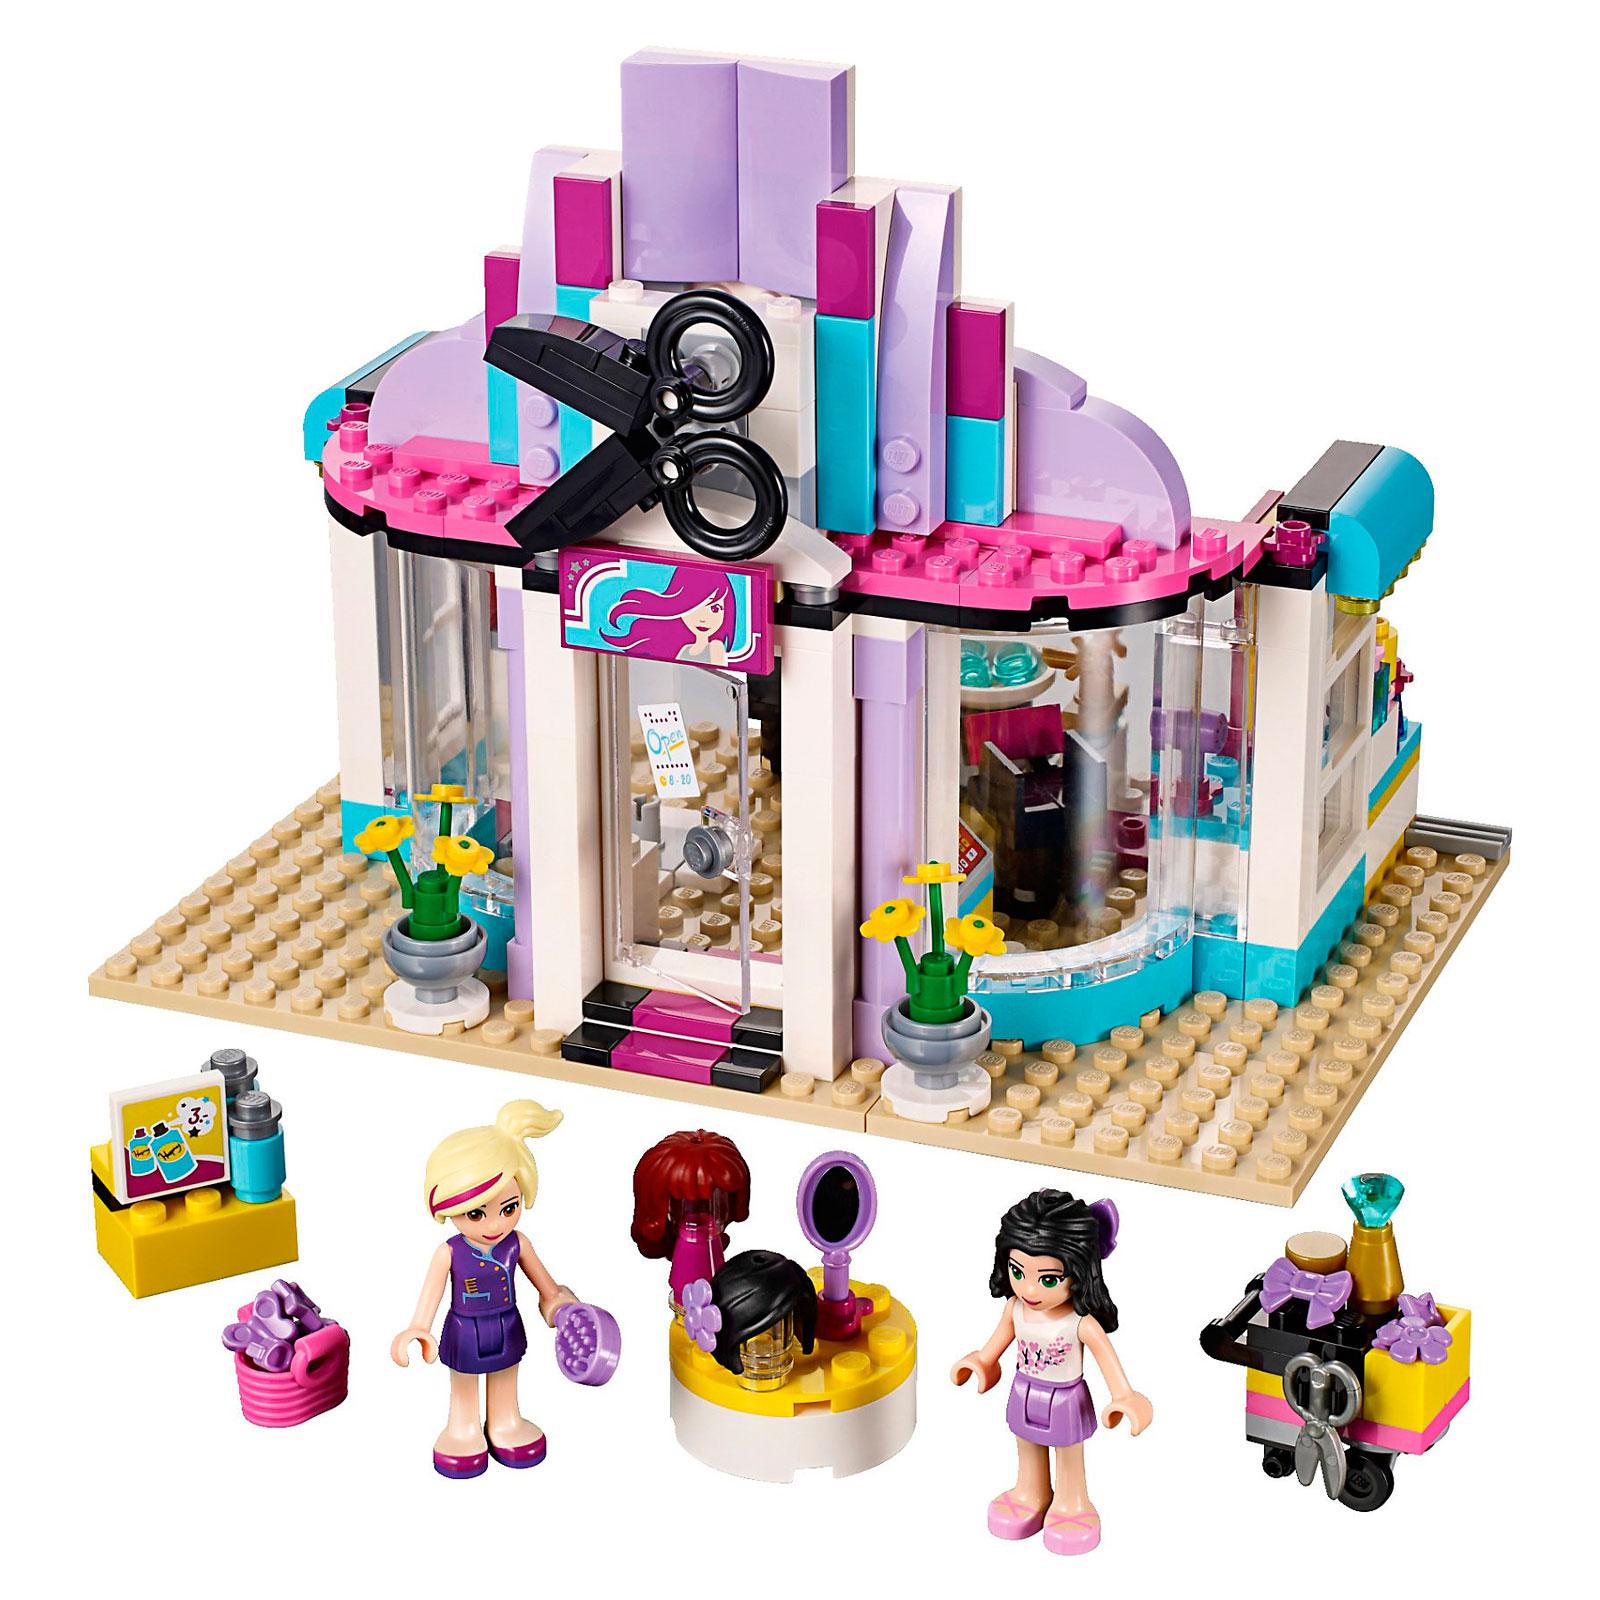 Конструктор LEGO Friends 41093 Парикмахерская<br>